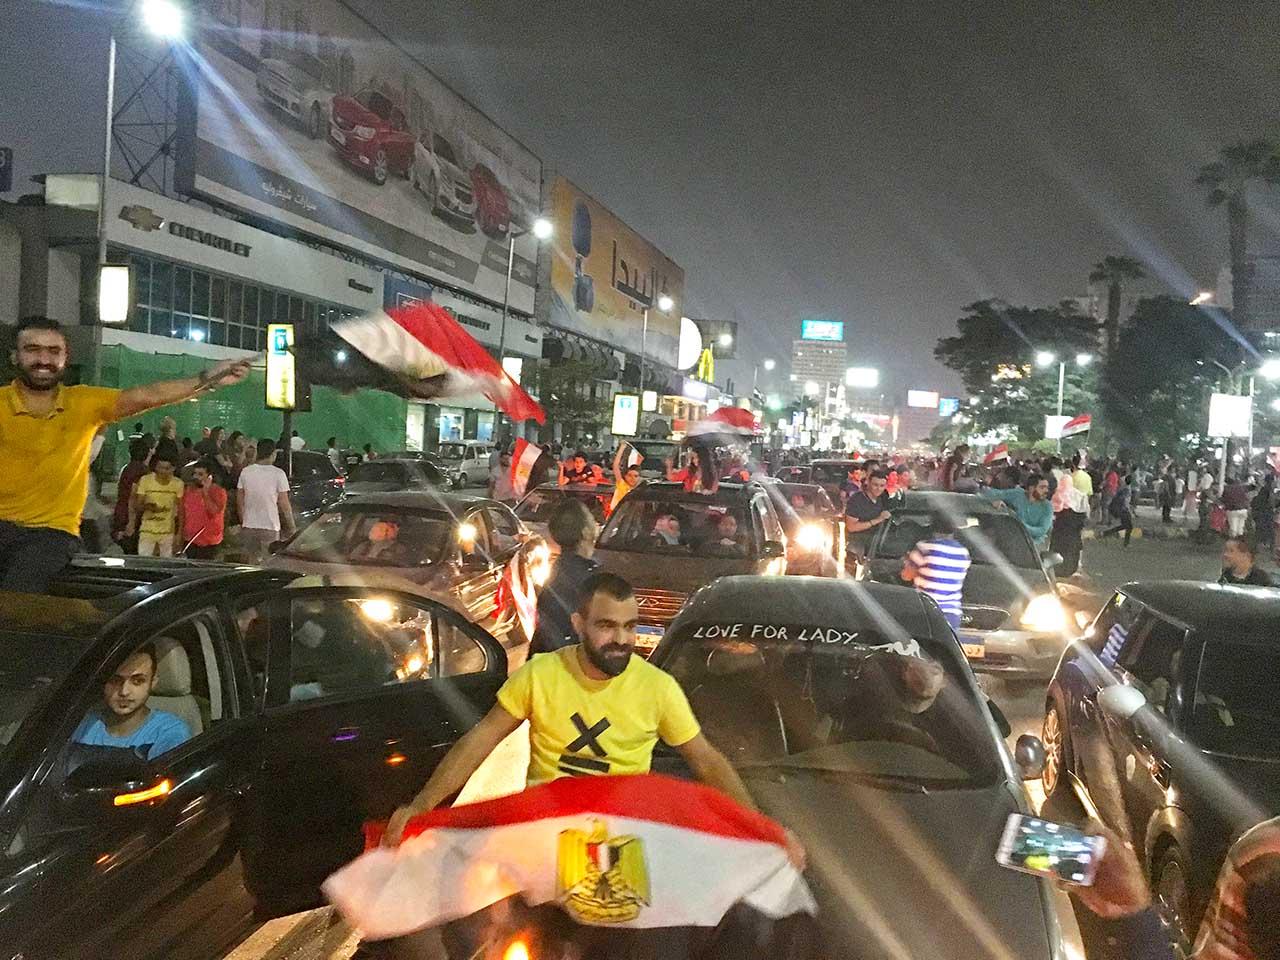 fatos interessantes sobre o Egito